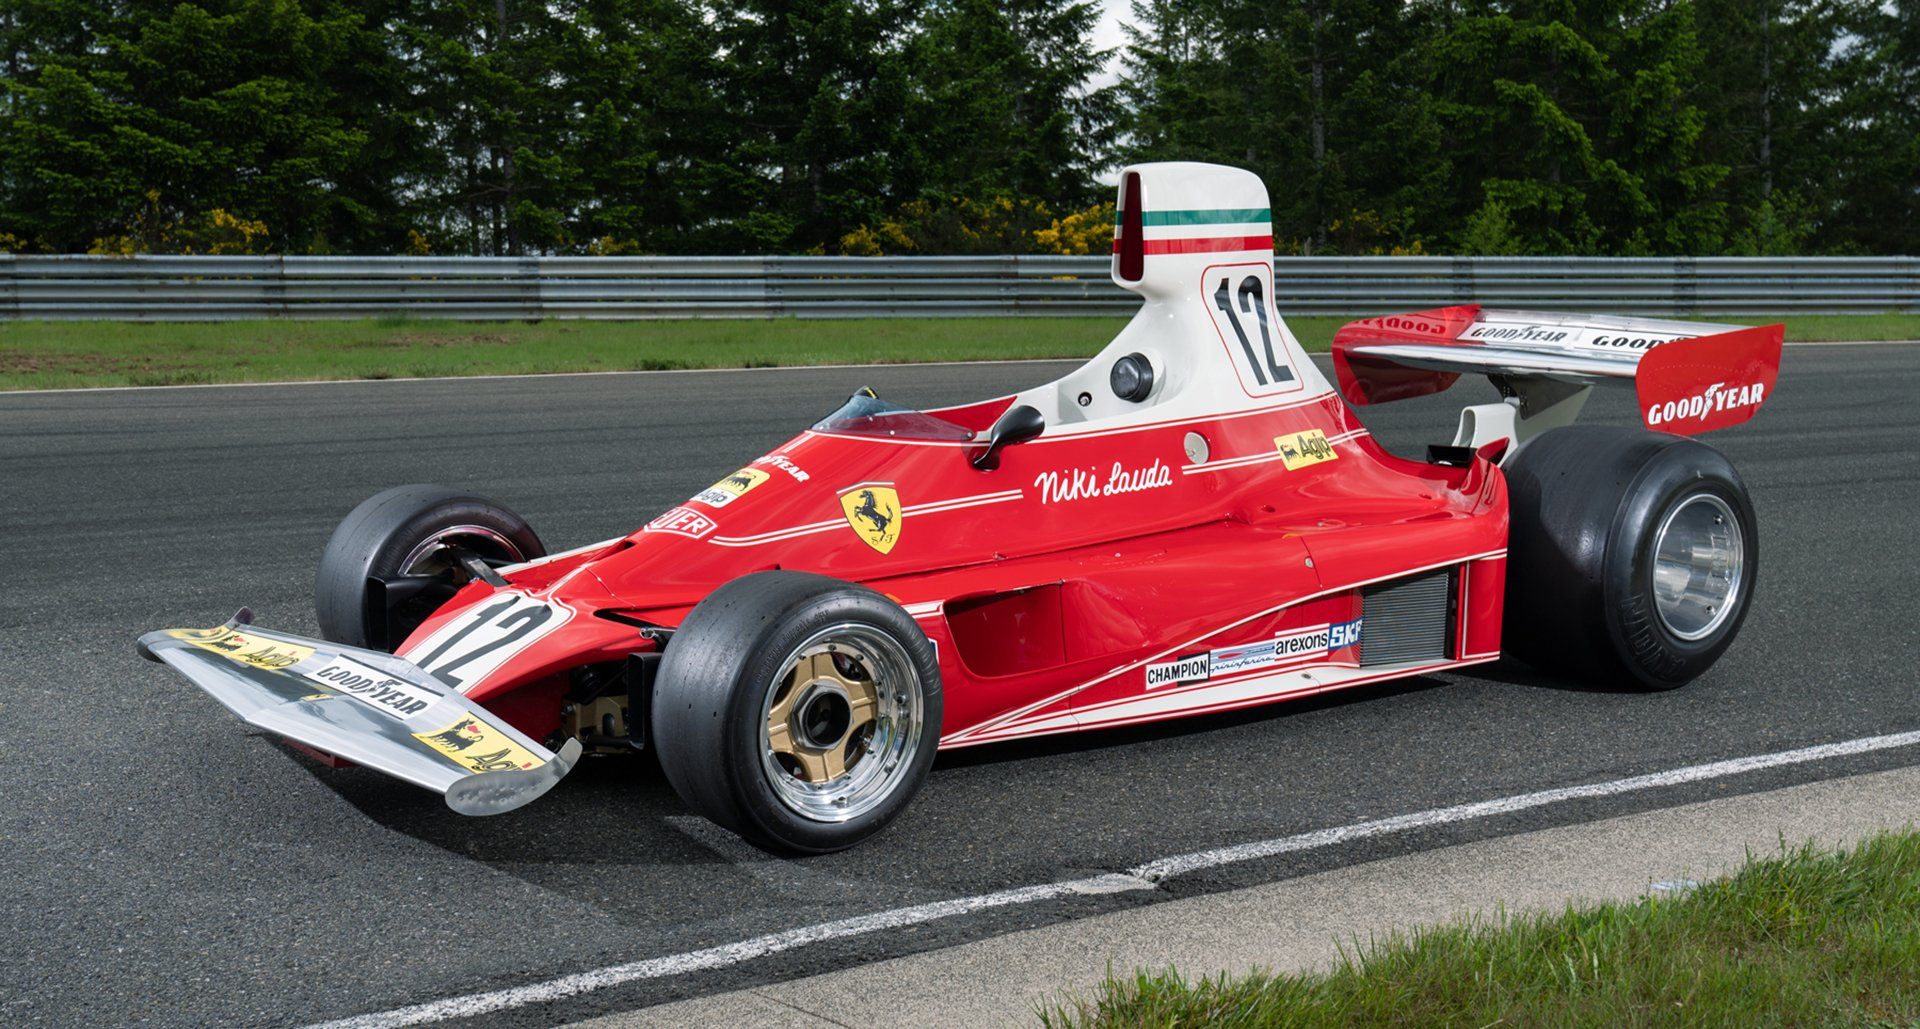 Ferrari 312T 1975 Niki Lauda auction Pebble Beach - 1